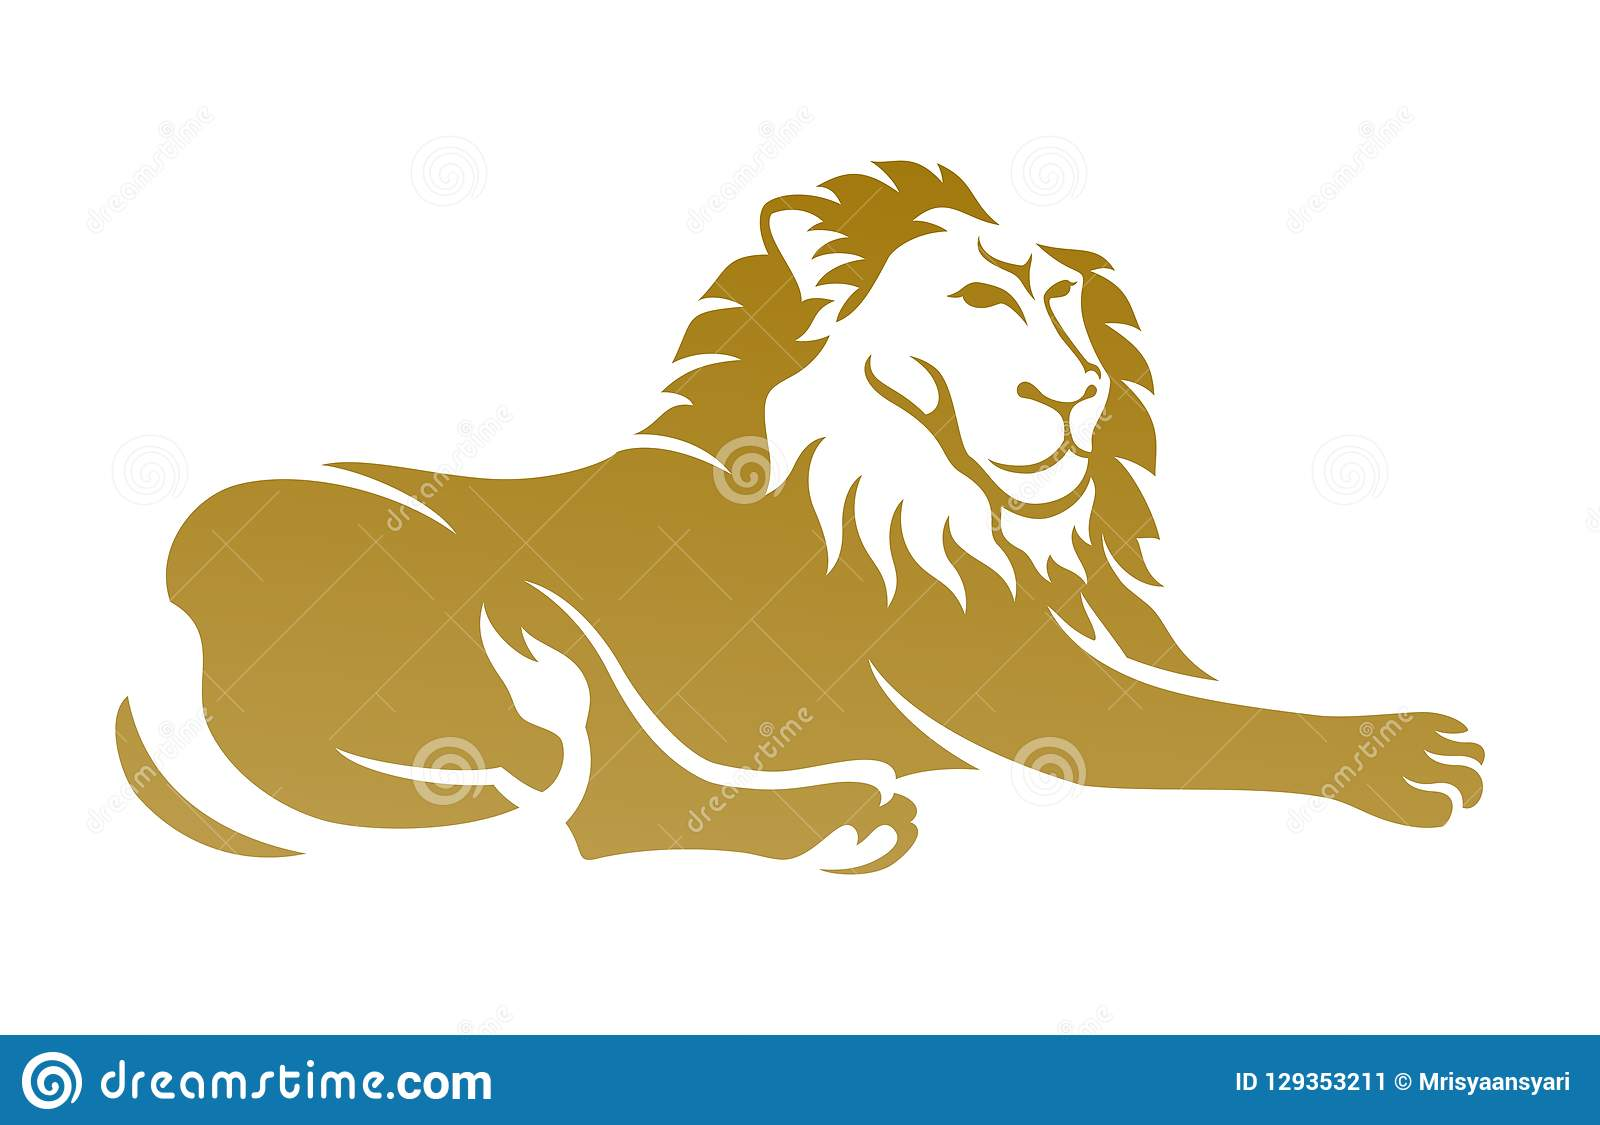 Lion Clipart Stock Vector Illustration Of Editable 129353211